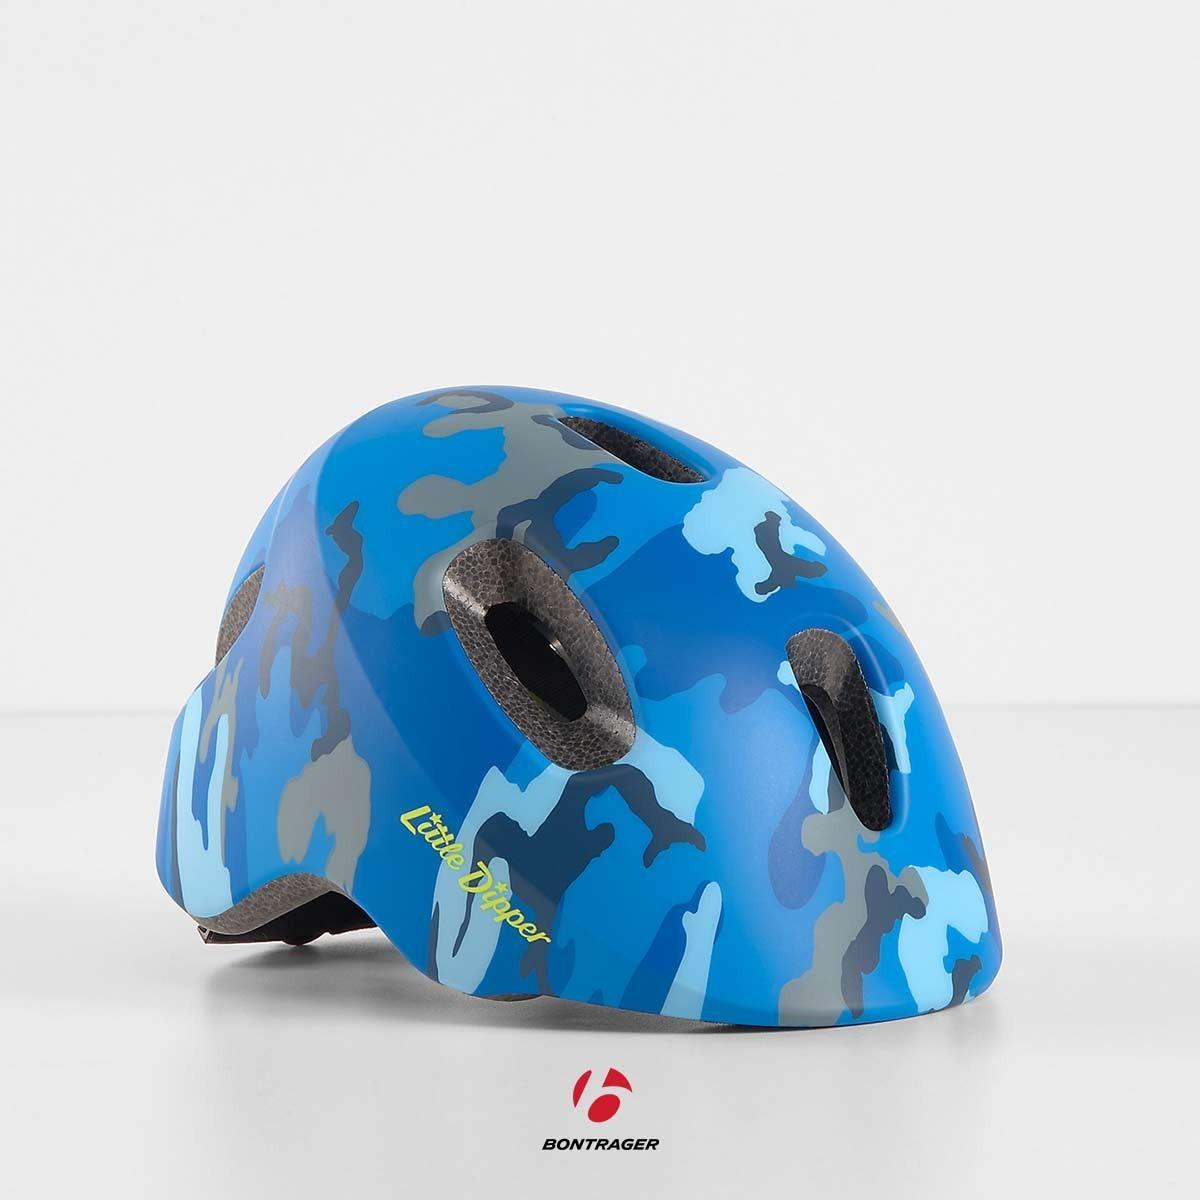 BONTRAGER LITTLE DIPPER MIPS Waterloo Blue - Изображение - AQUAMATRIX